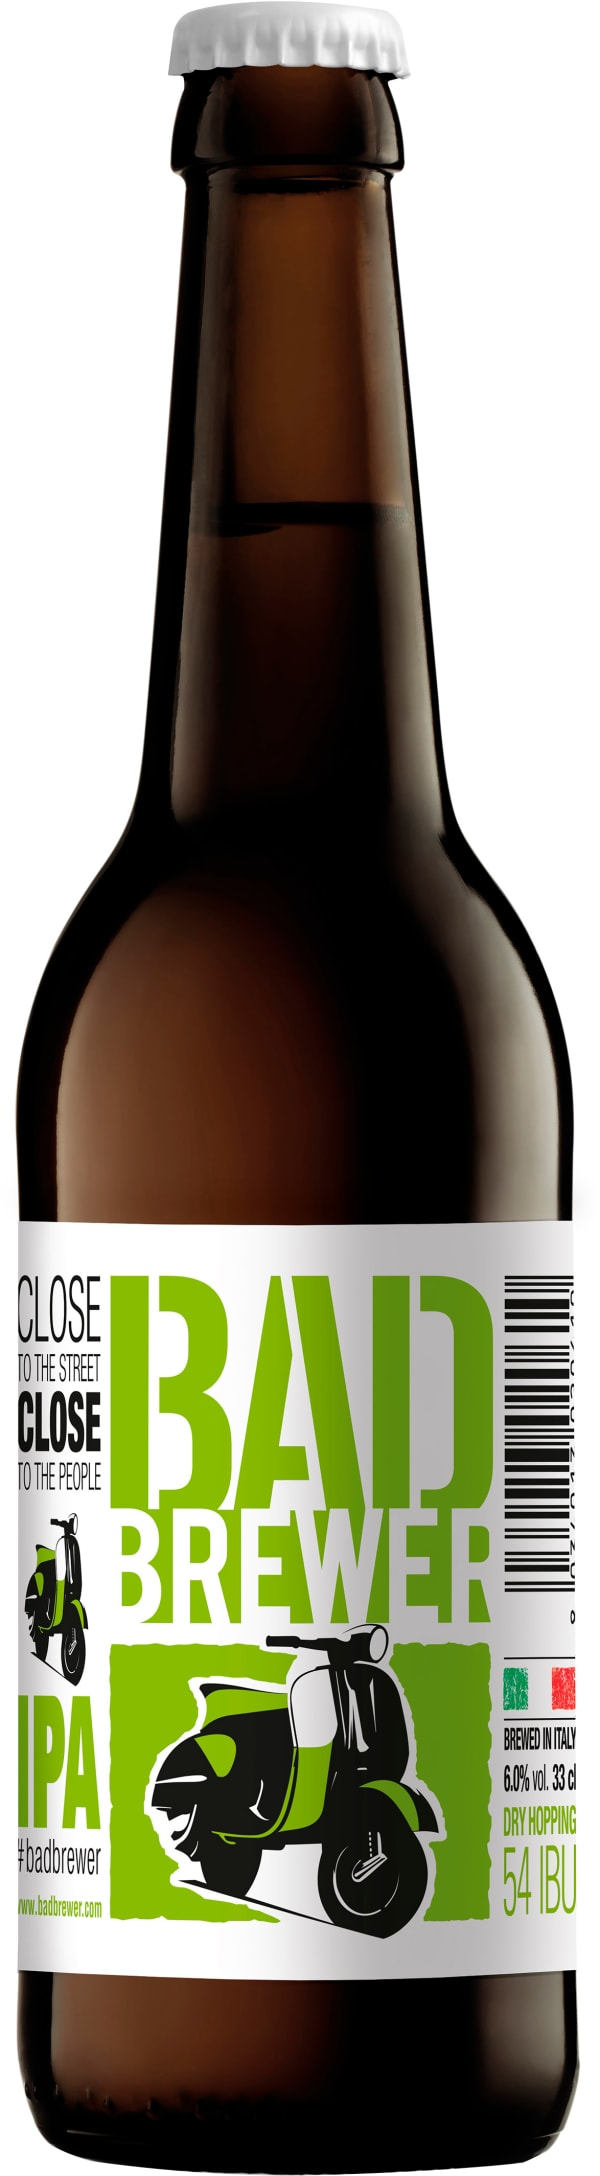 Bad Brewer IPA